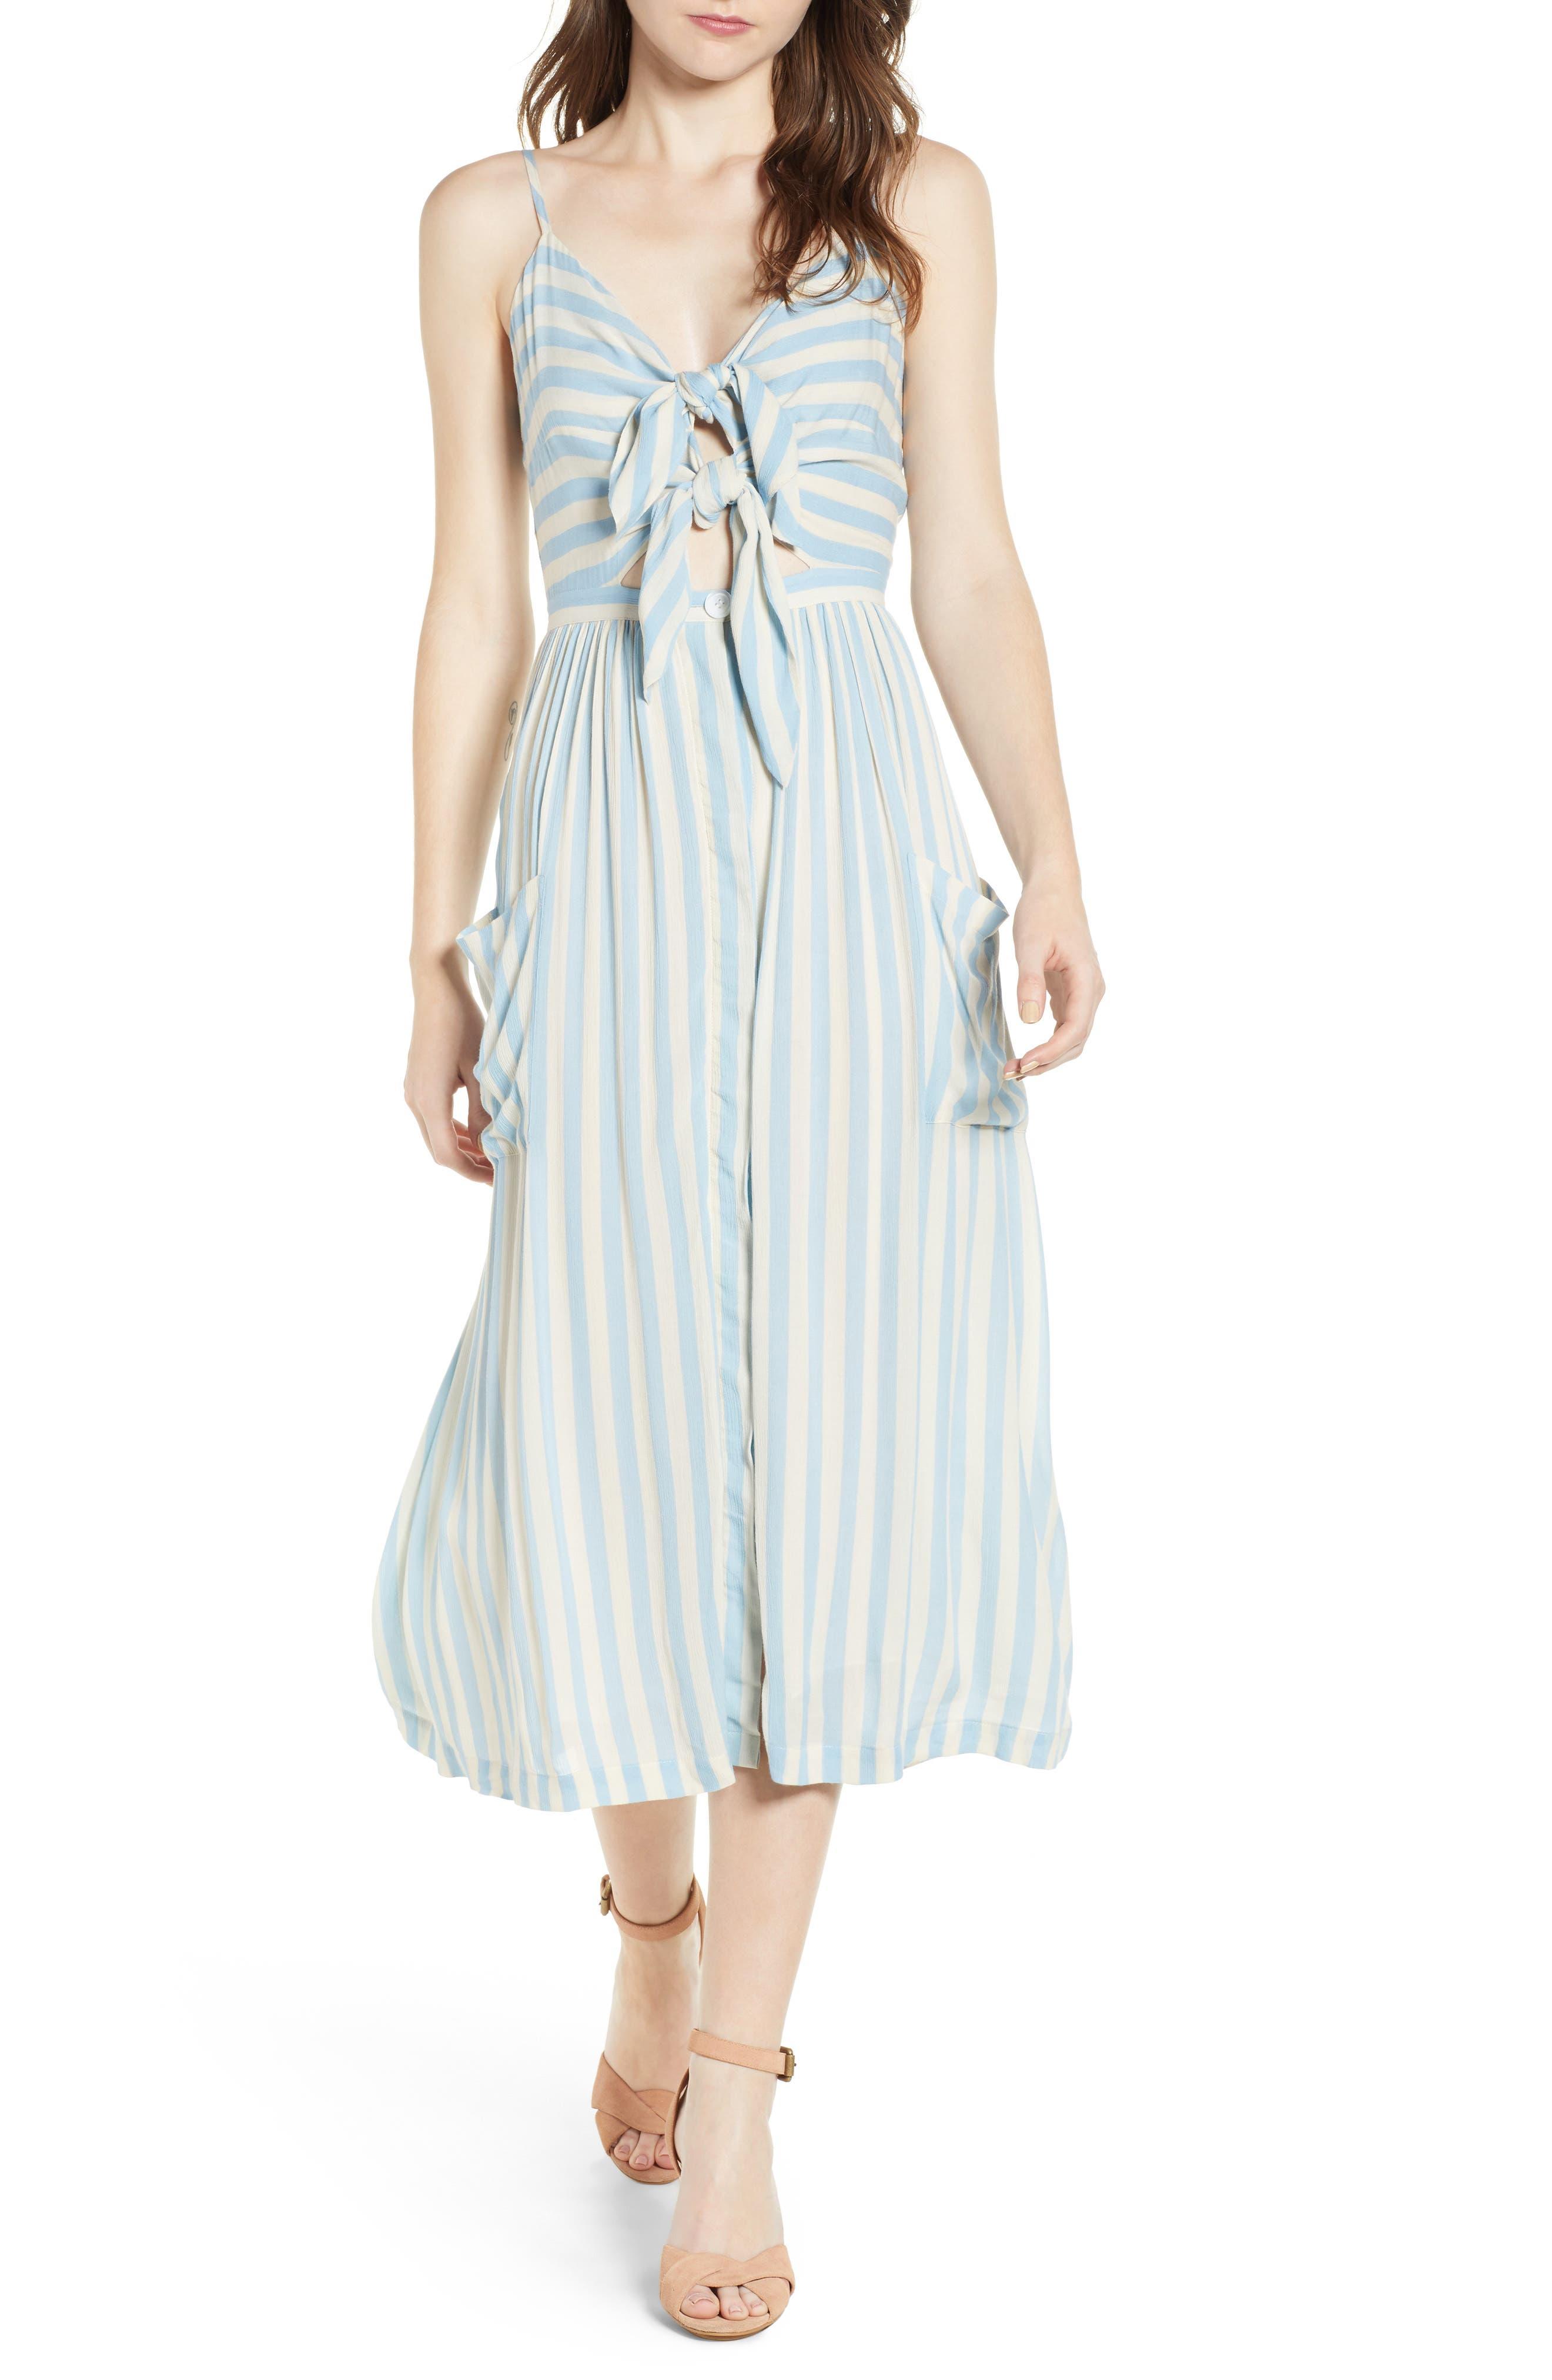 Derinda Dress,                             Main thumbnail 1, color,                             Blue Multi